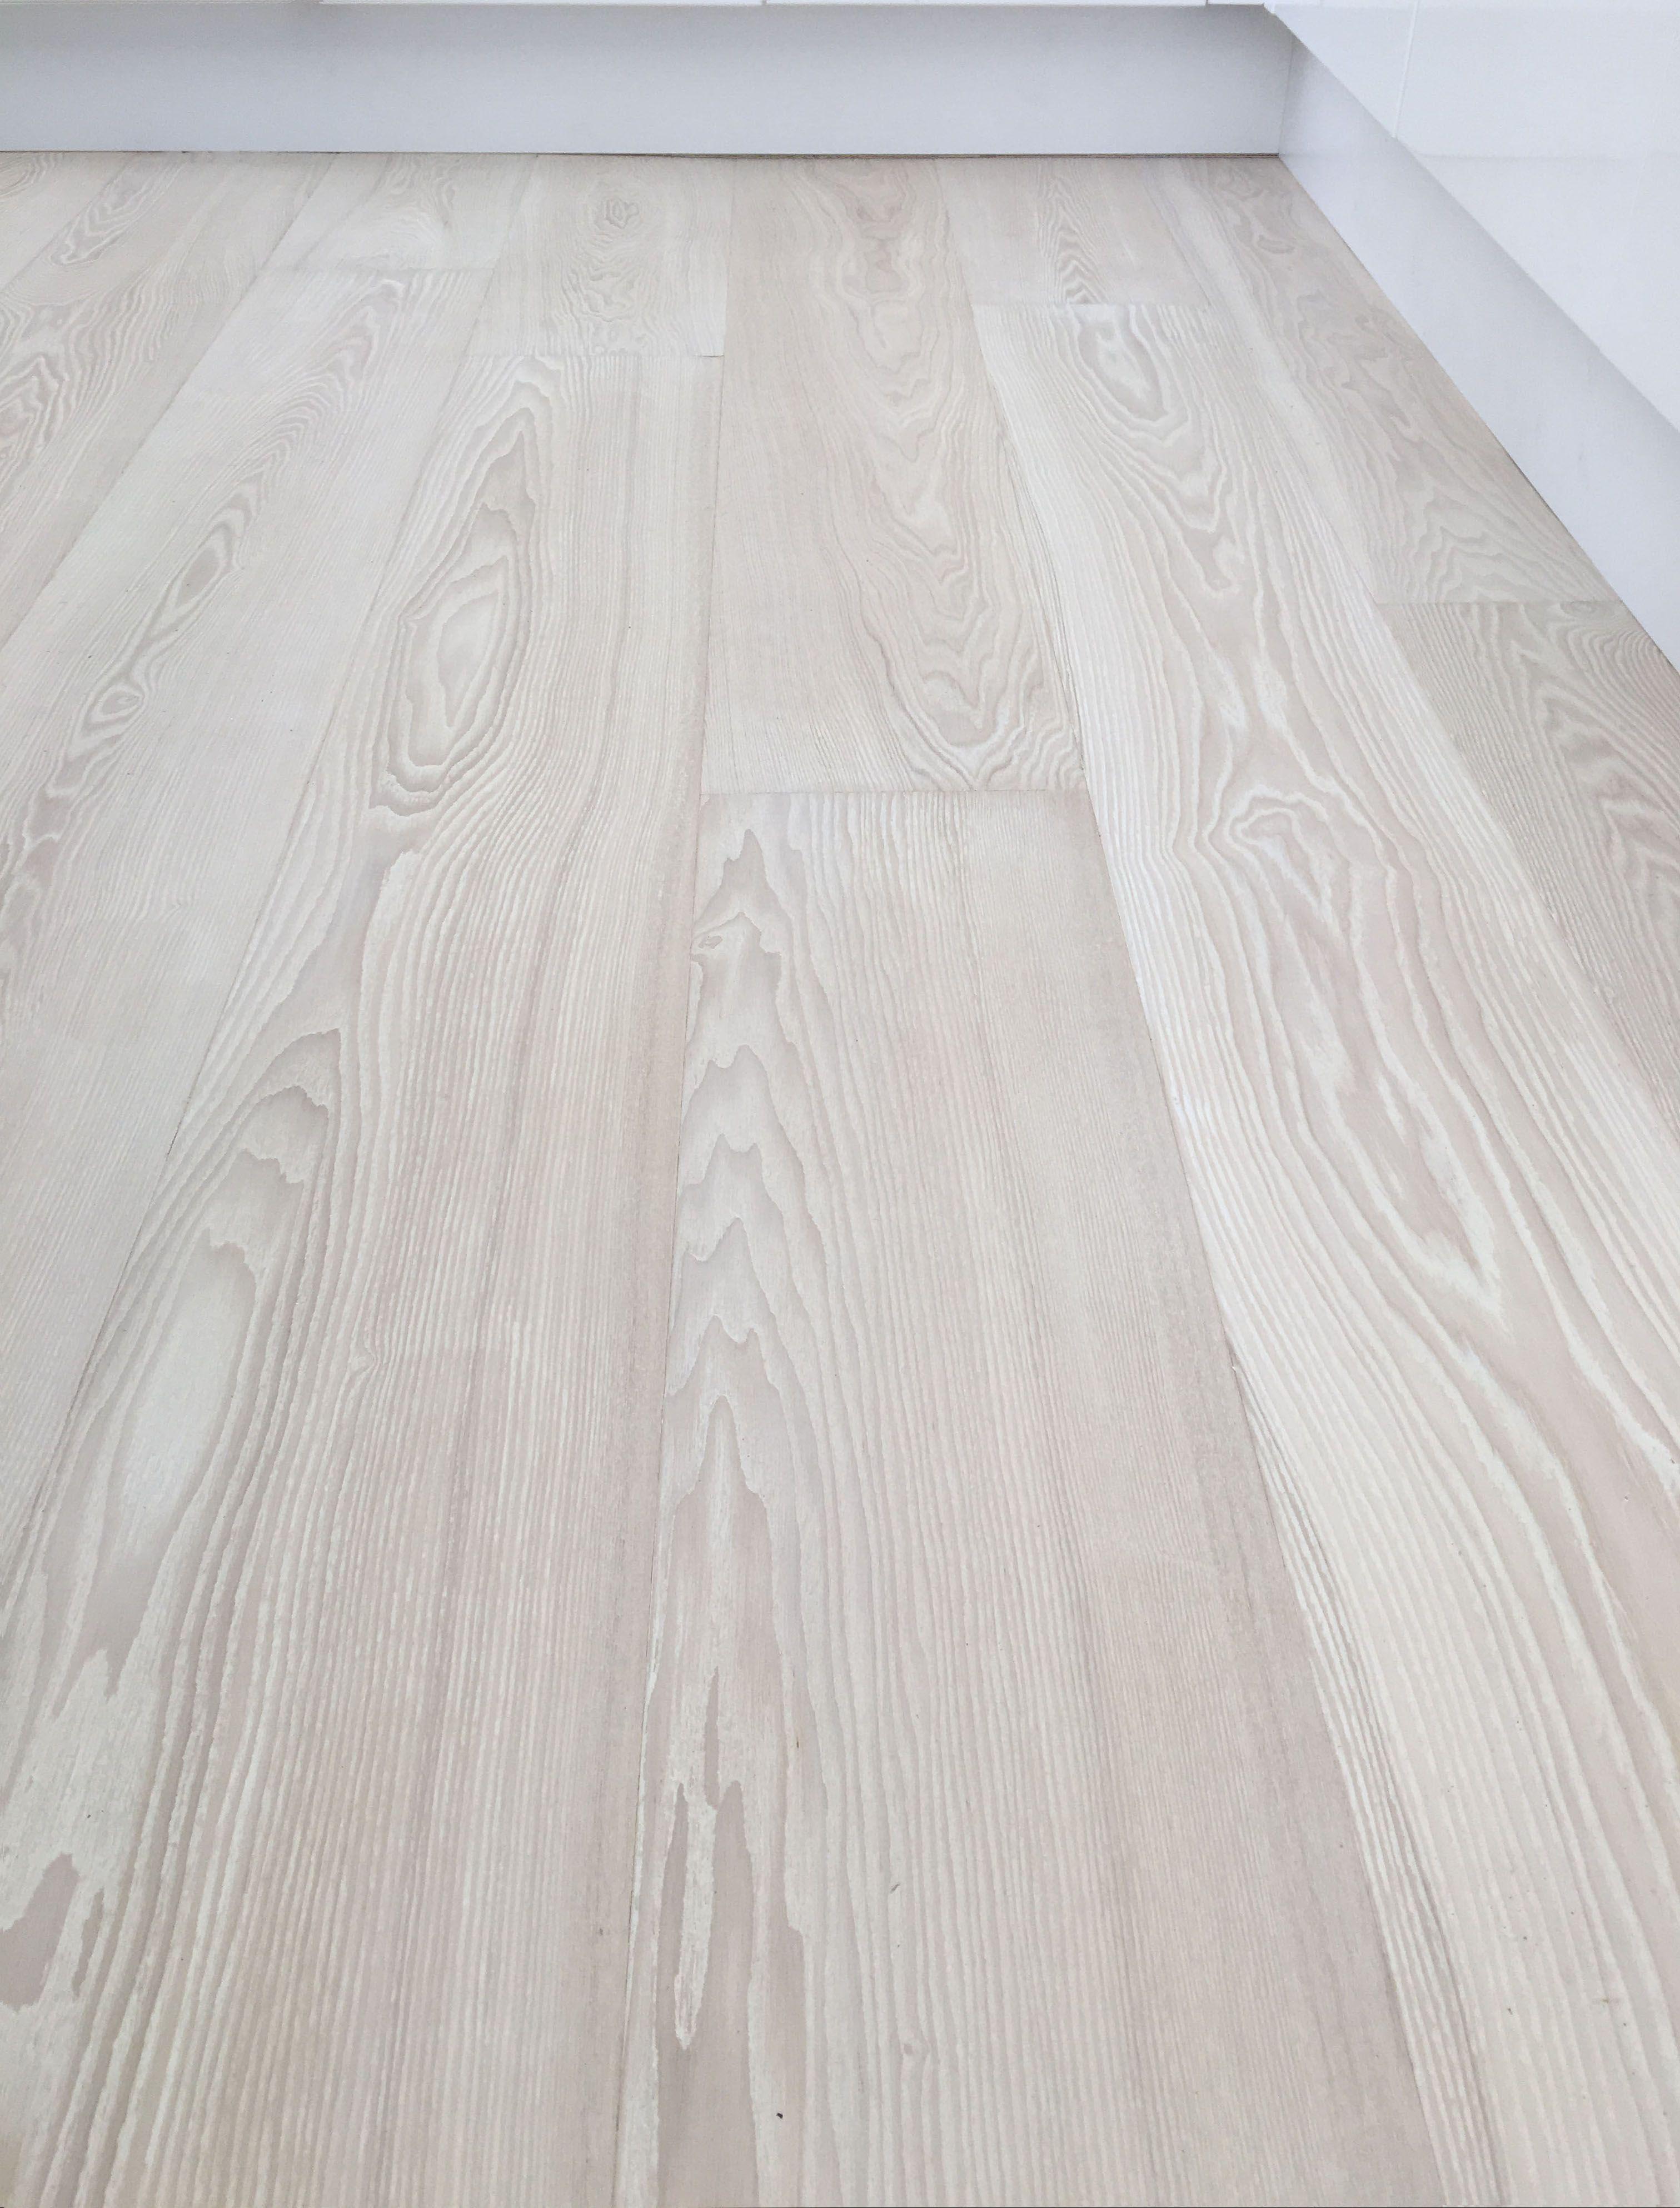 White Engineered Hardwood Flooring, White Ash Laminate Flooring